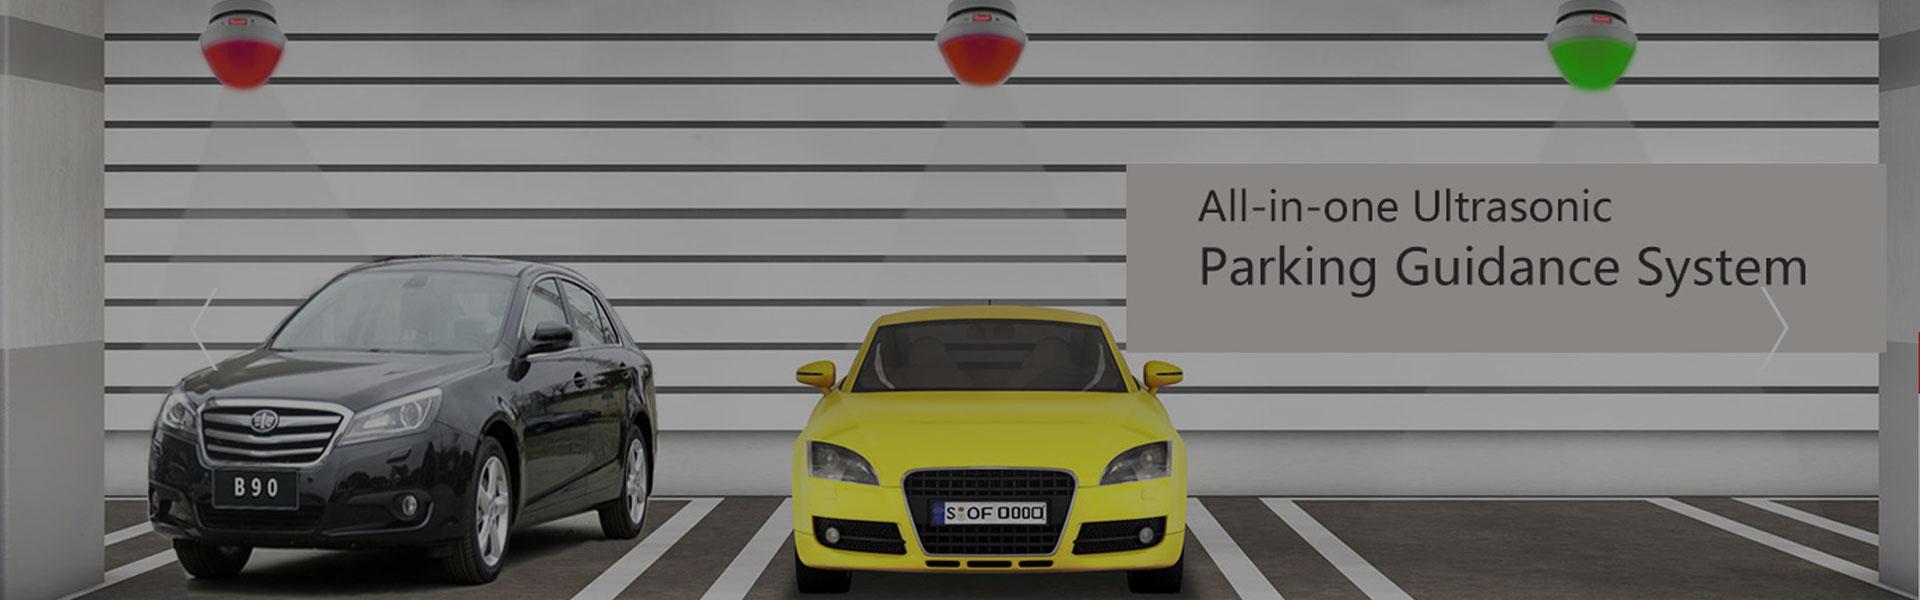 Automatic-Bollards-Baggage-Scanner-Road-Blockers-uvss-barrier-ETD